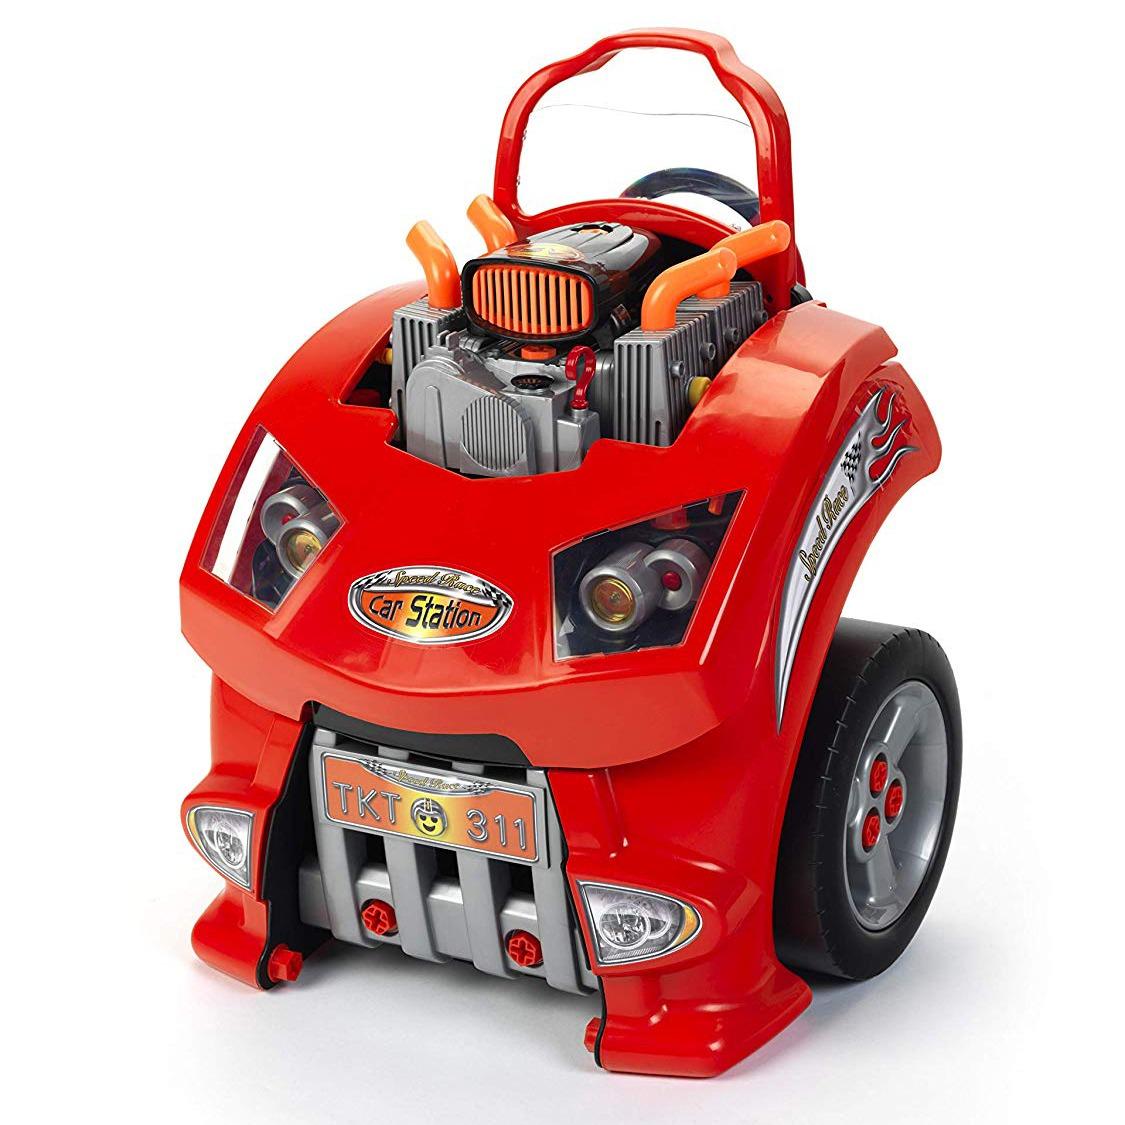 Mechanic's Toy Car 6